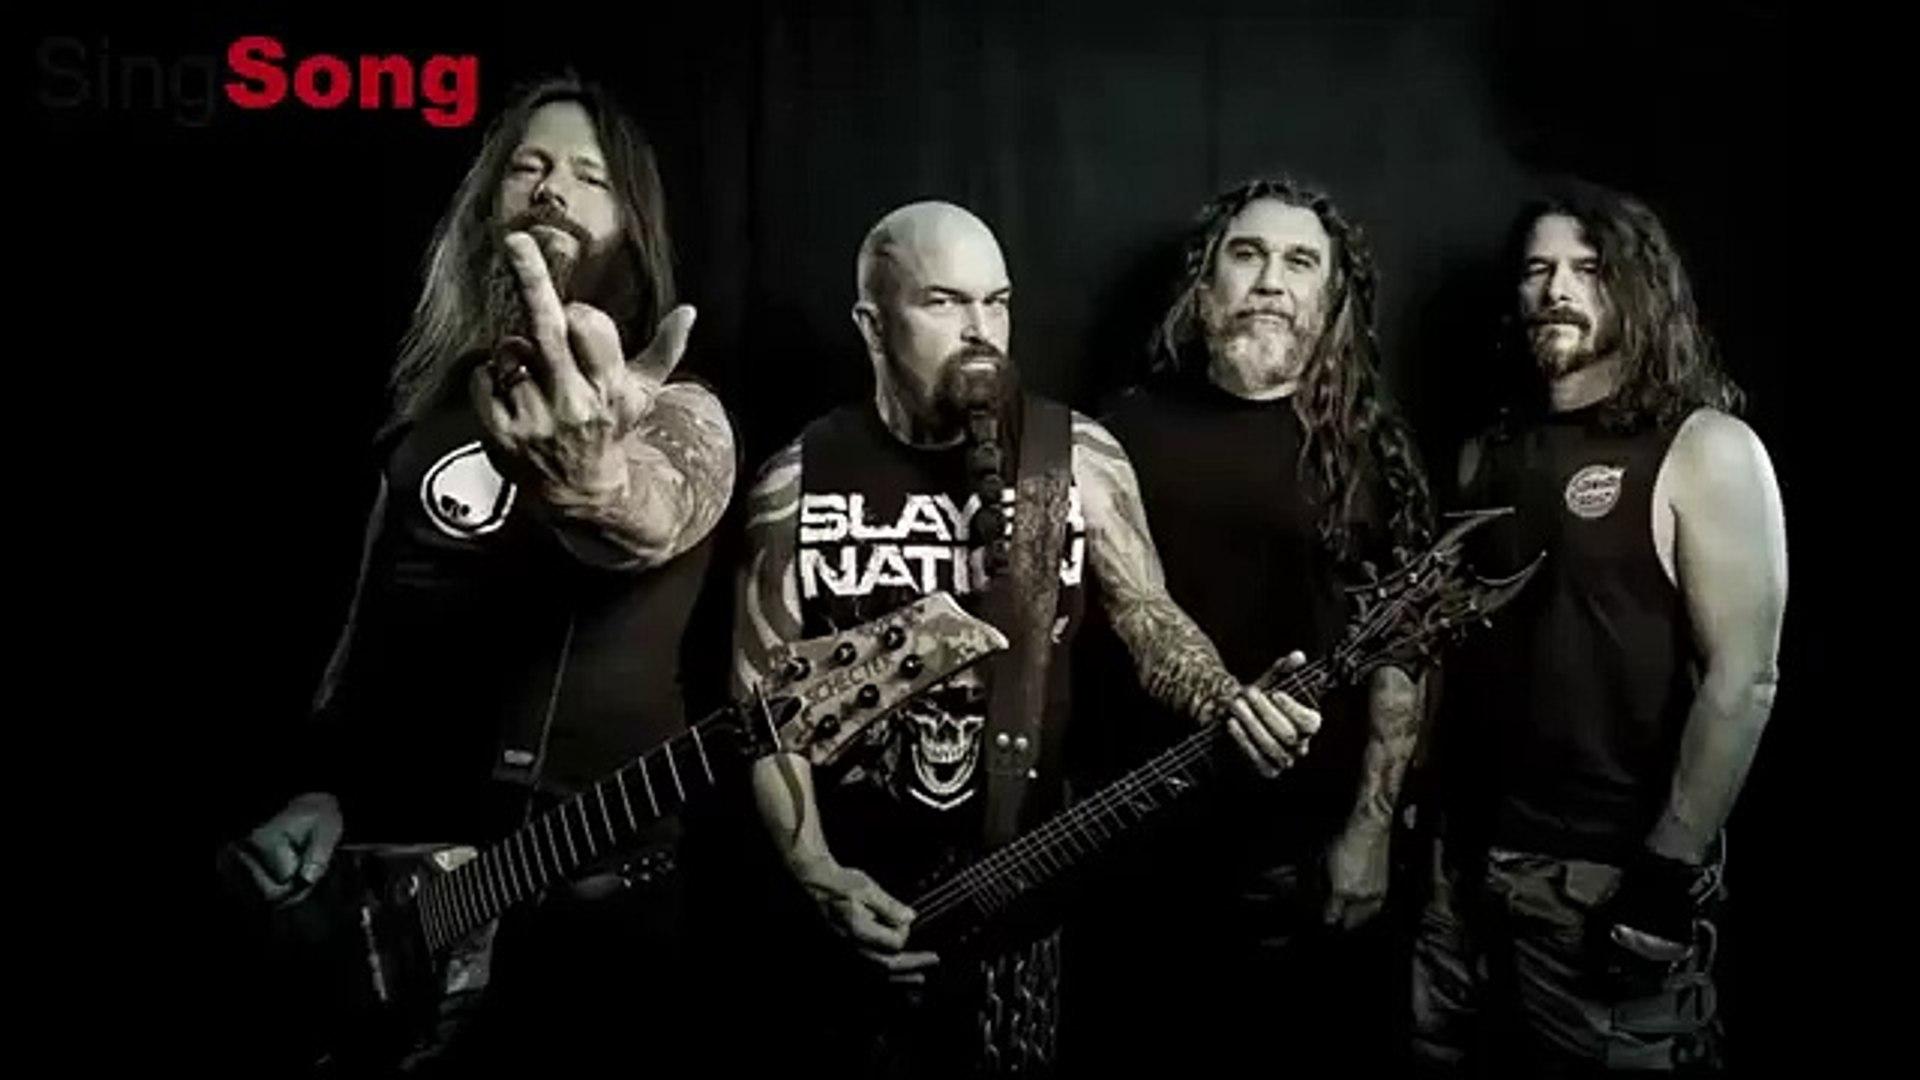 You Againts You - Slayer (Music Lyrics)